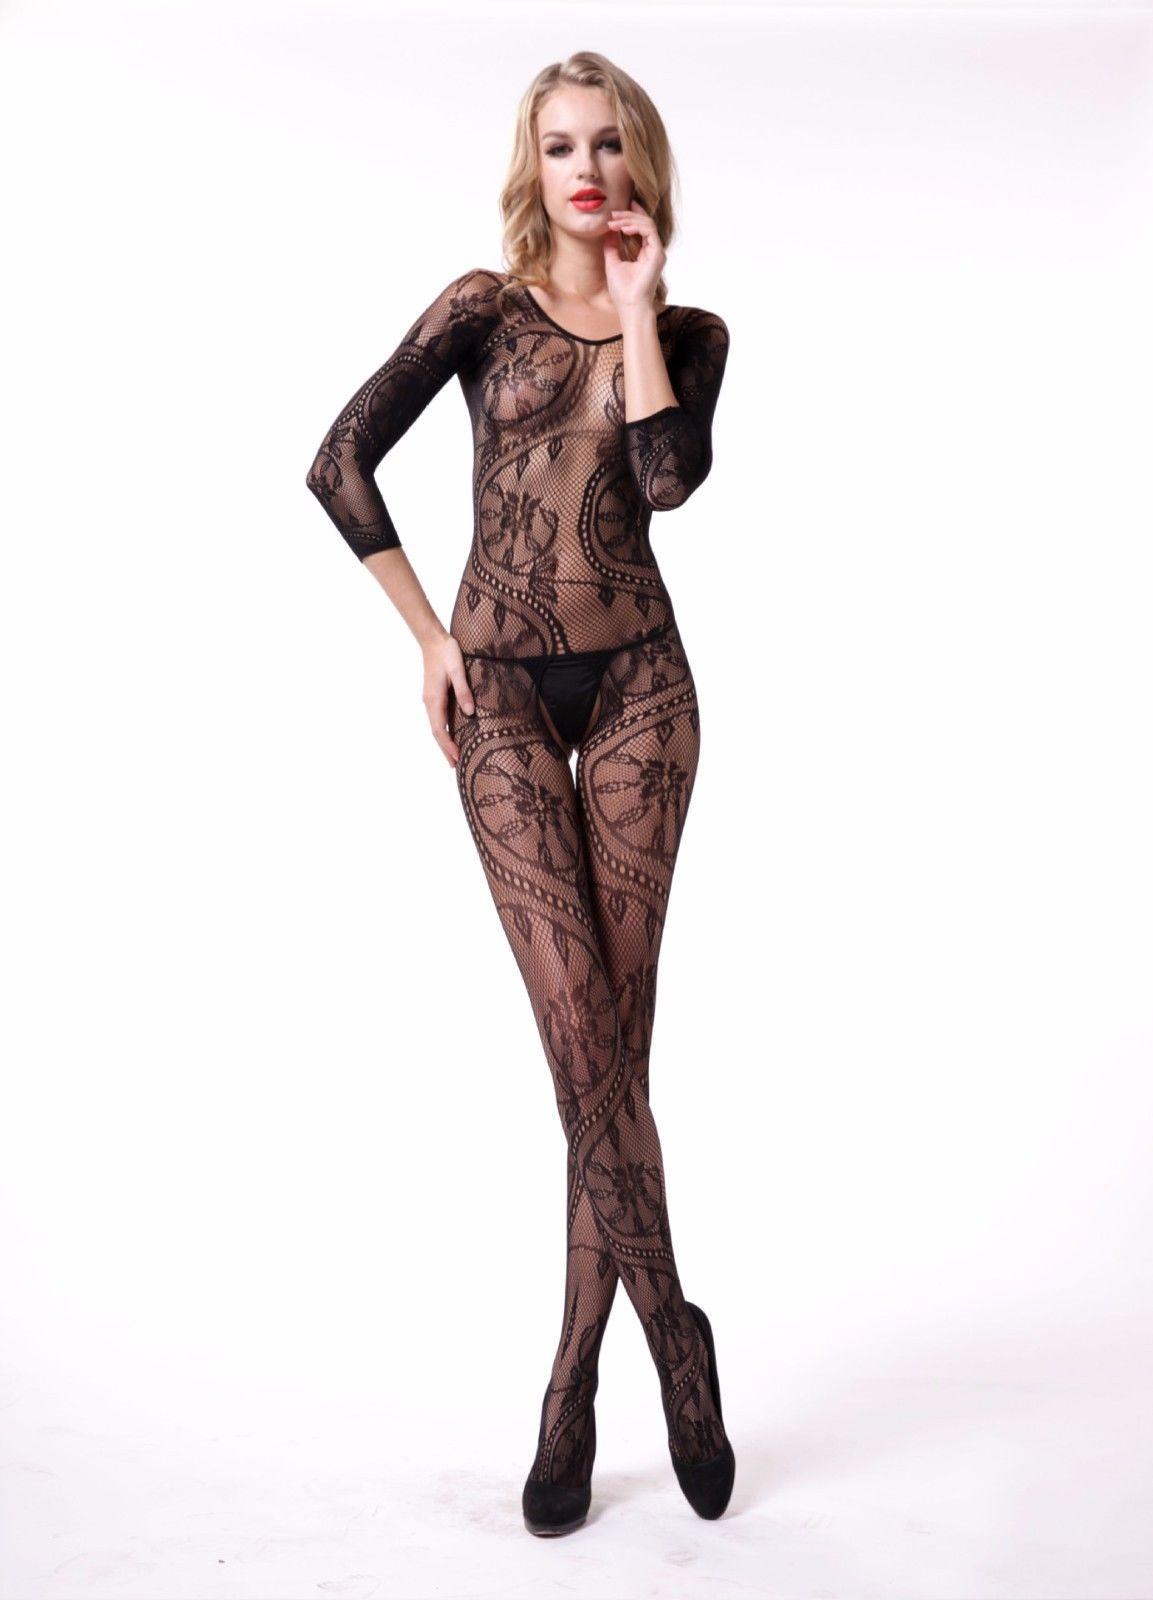 52d03b0832f7 Women Silk Stockings Jacquard Sexy Lingerie Open Crotch Pants One Size  ITC568 | eBay